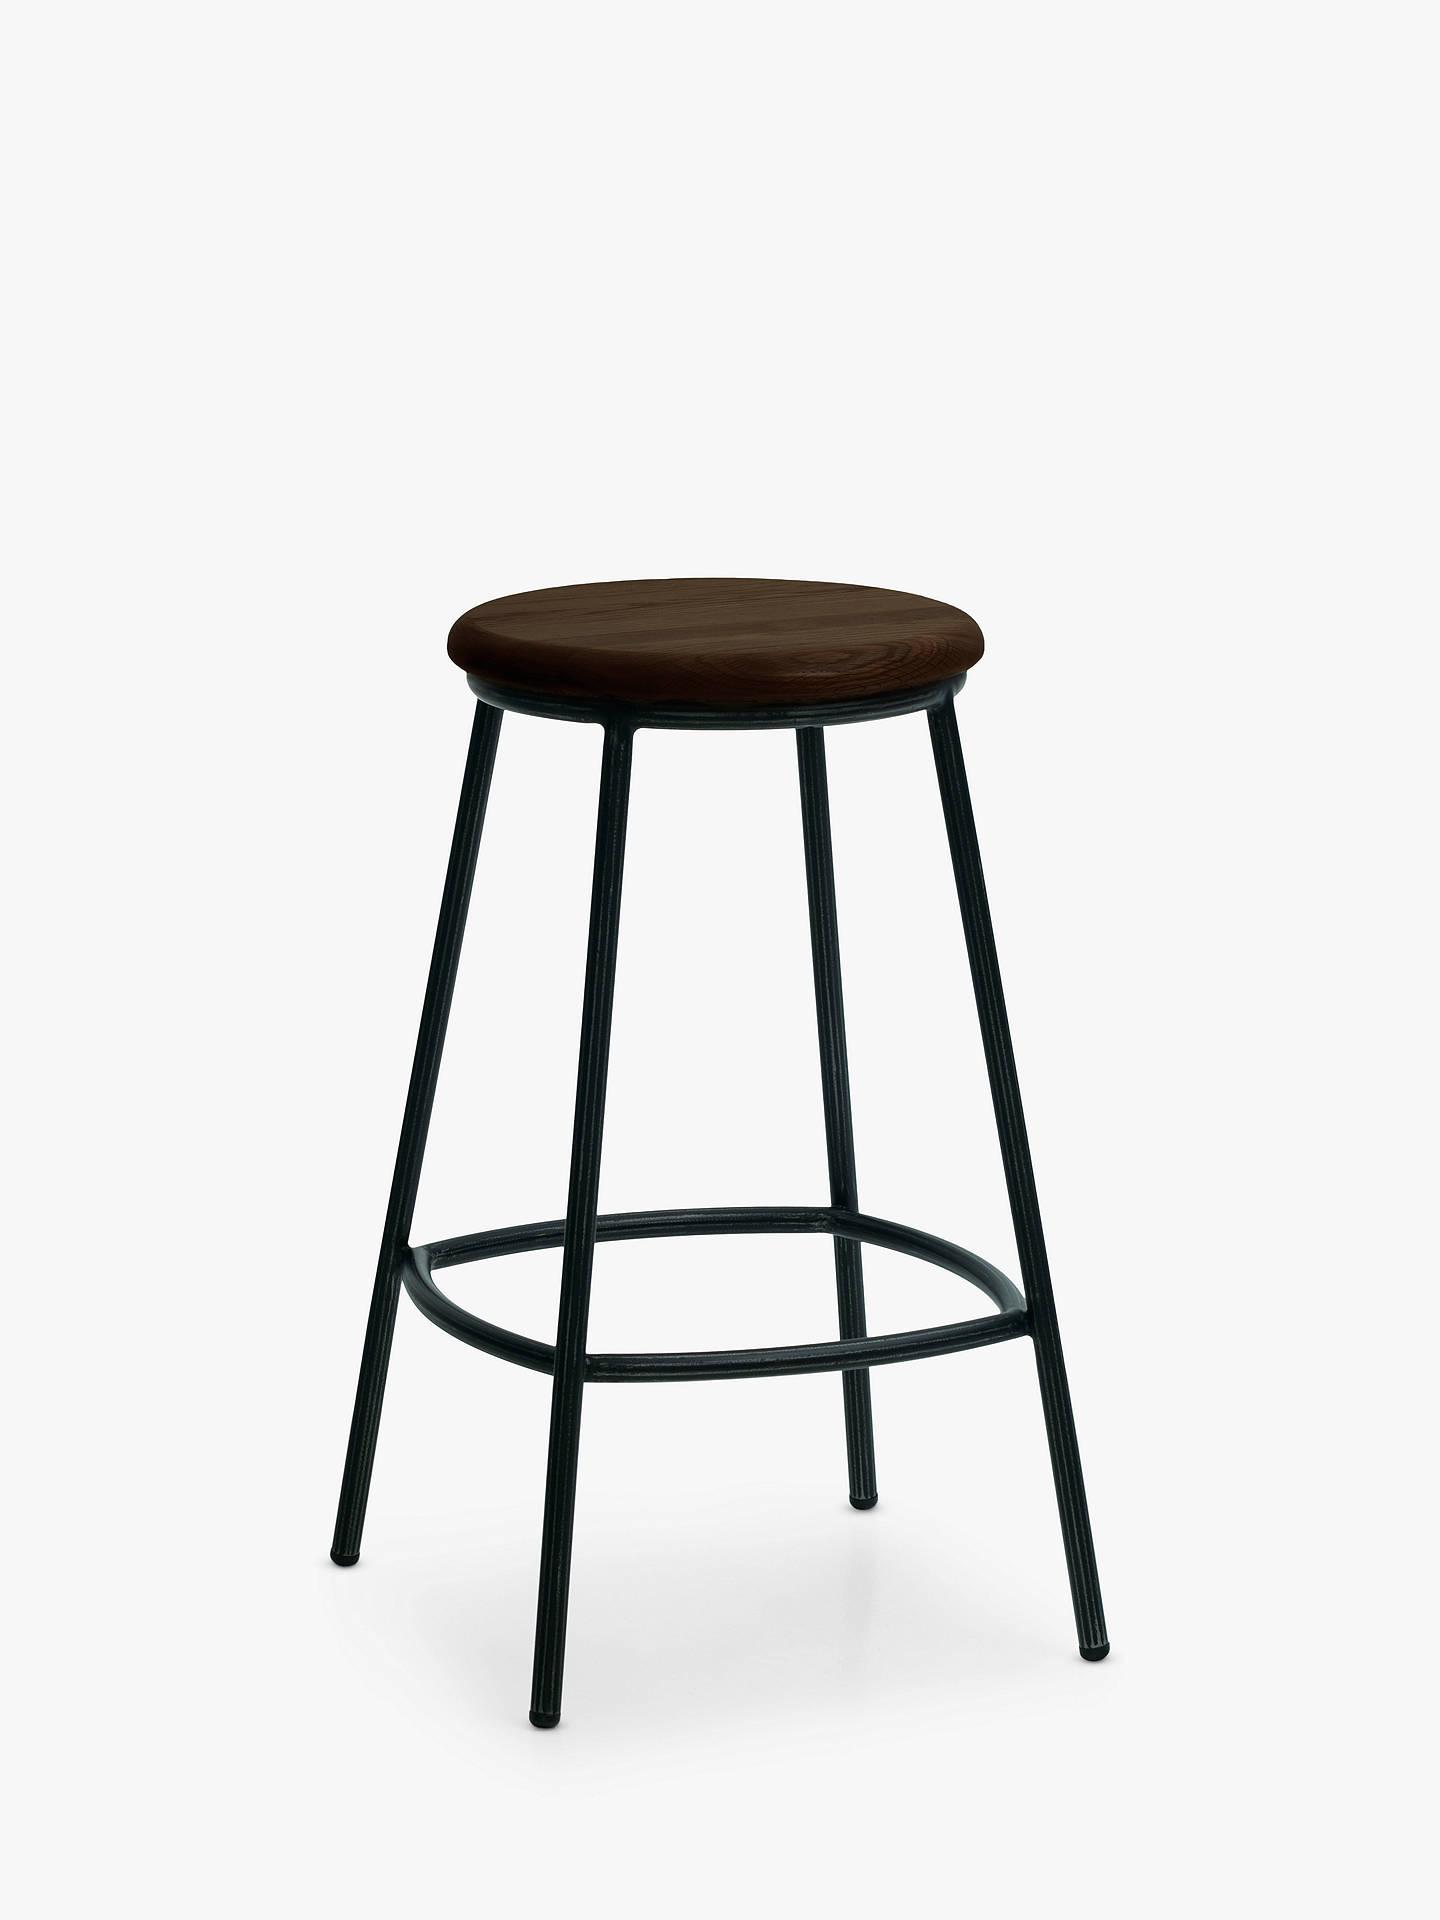 john lewis  partners calia bar stool at john lewis  partners